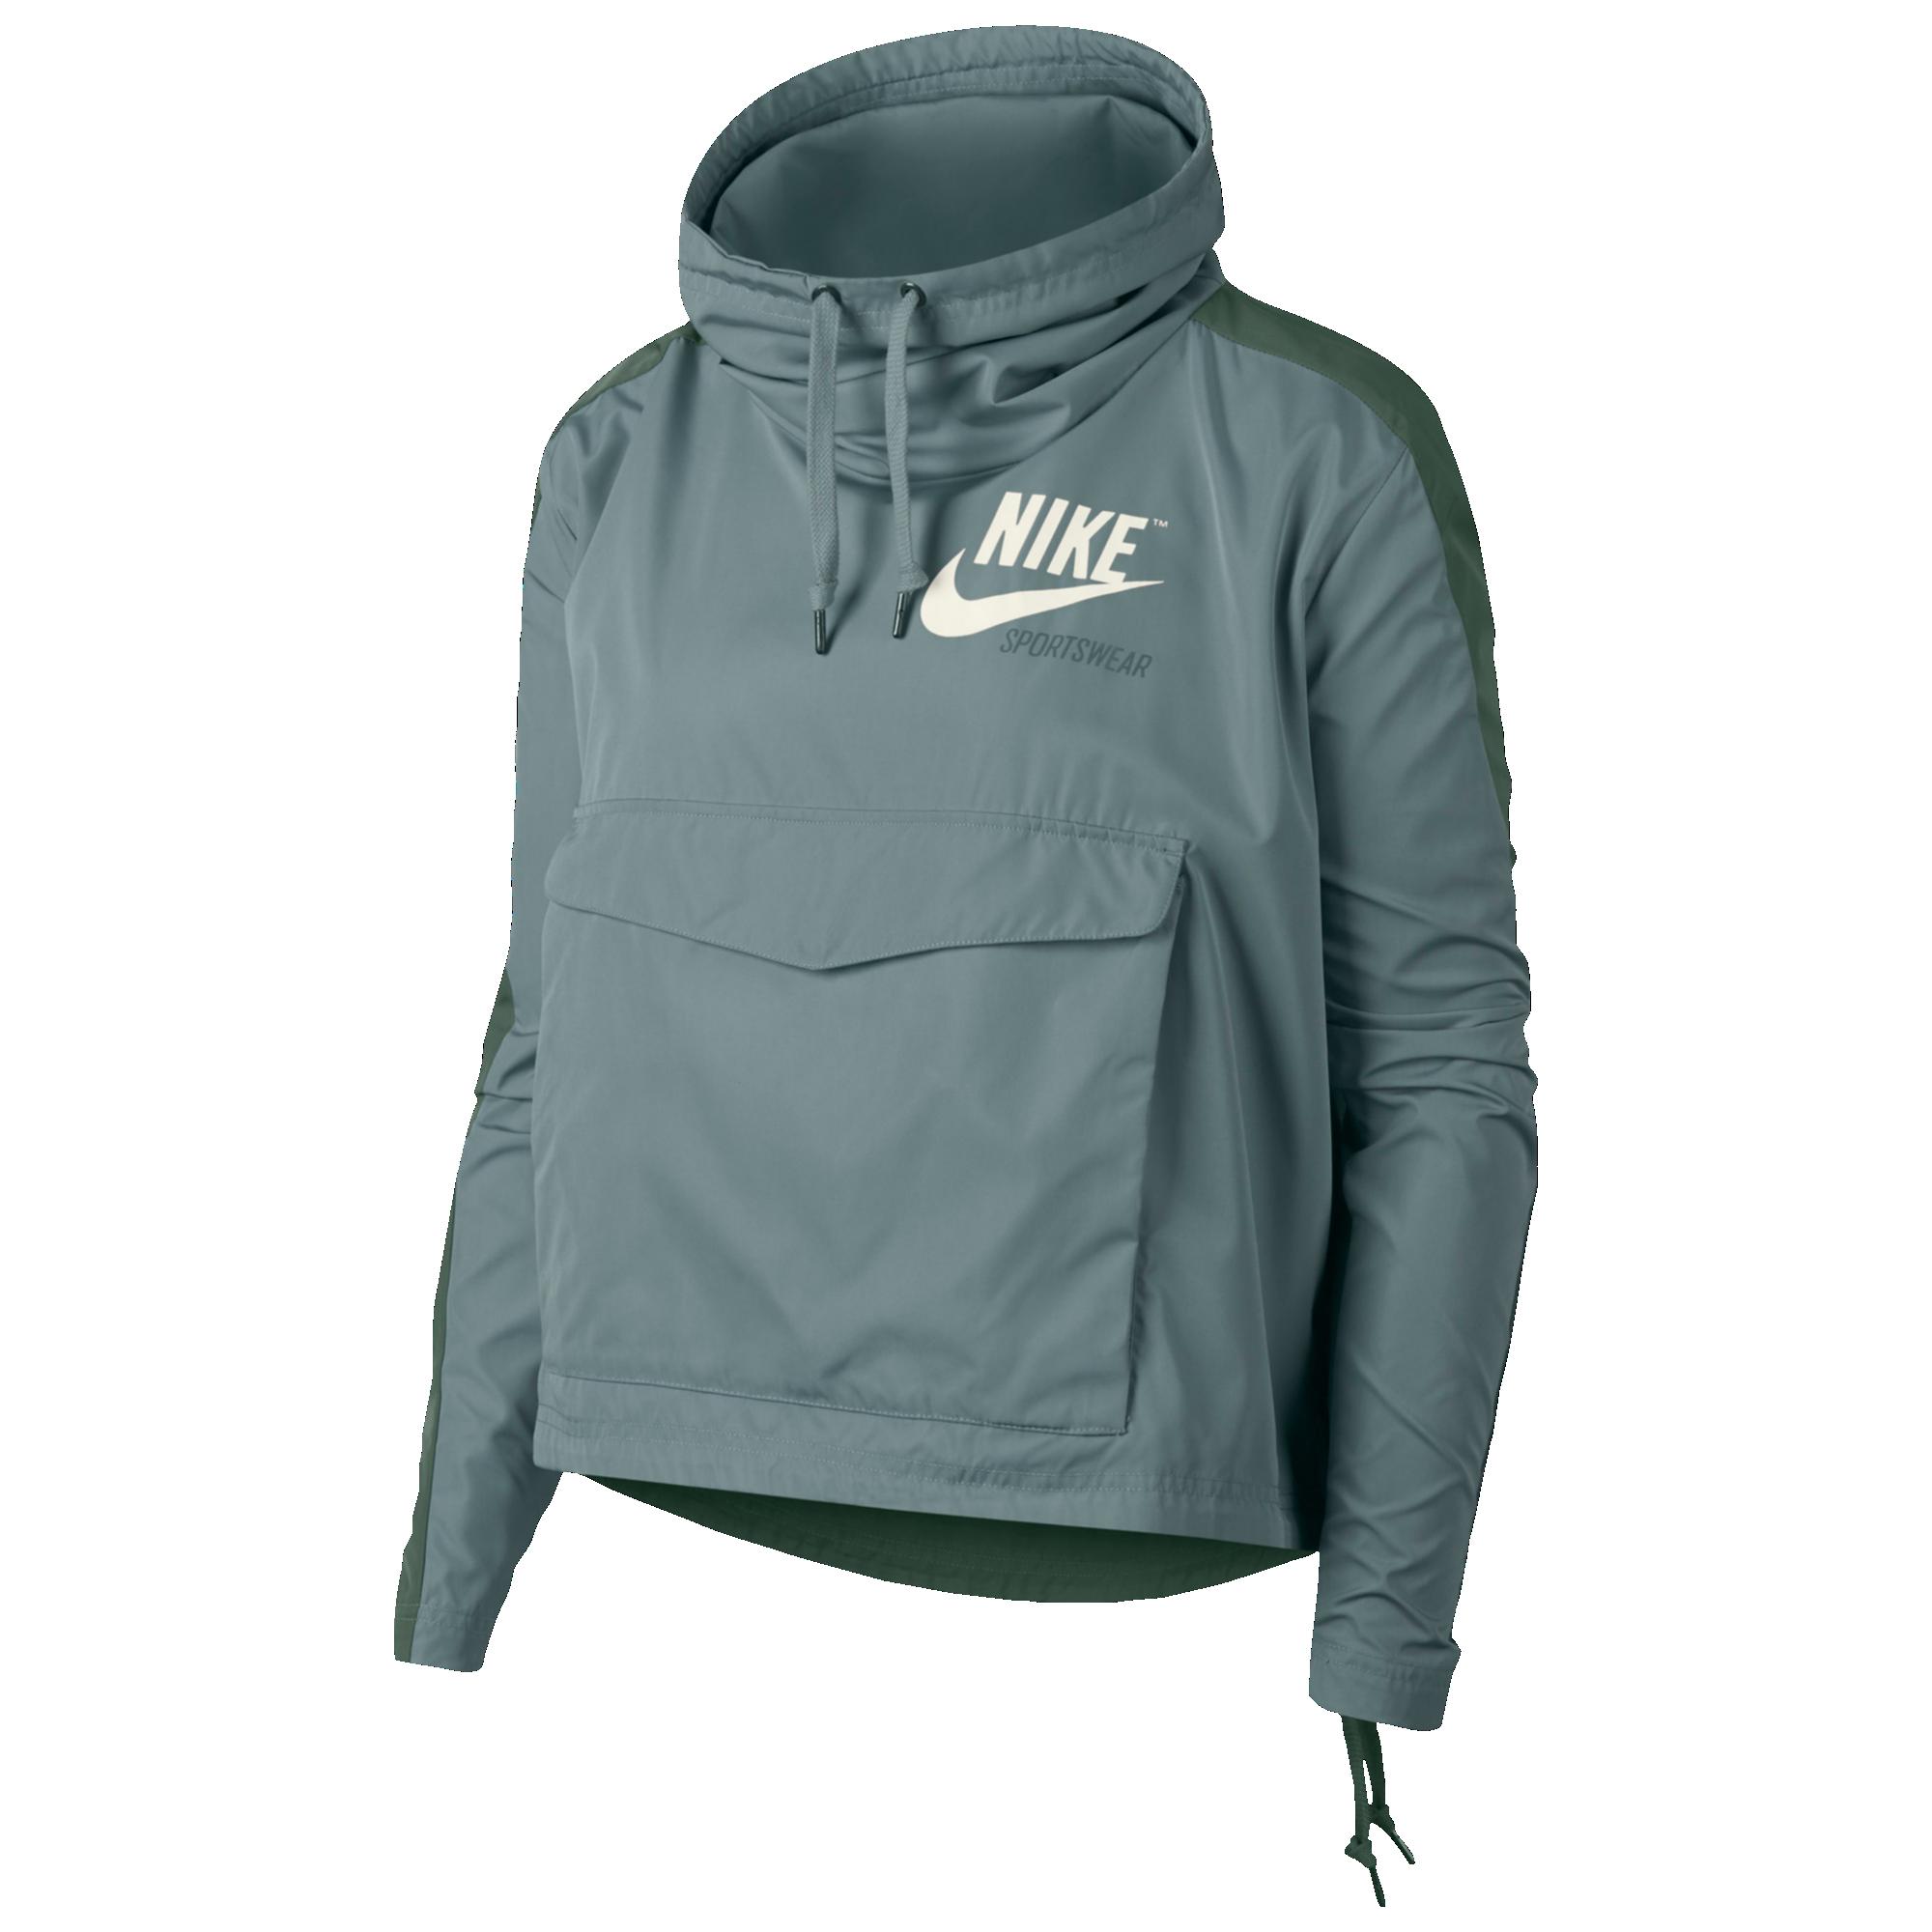 838fde76c425 Nike Archive Pullover Jacket - Women s